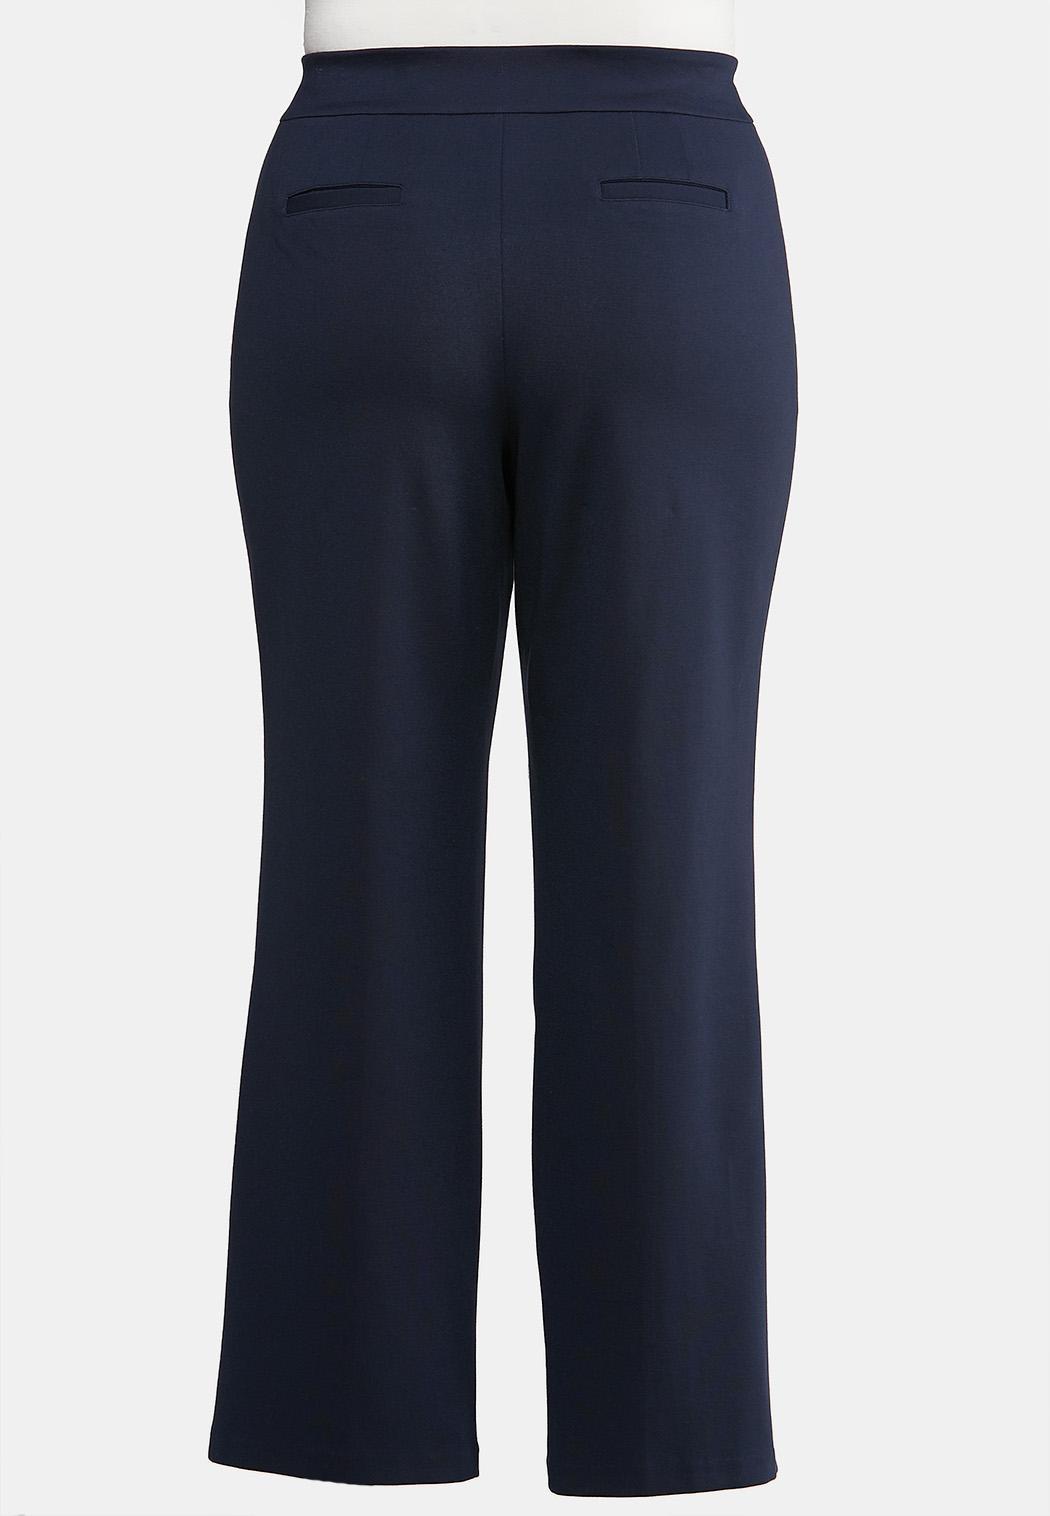 Extended Size Straight Leg Ponte Pants (Item #43919091)